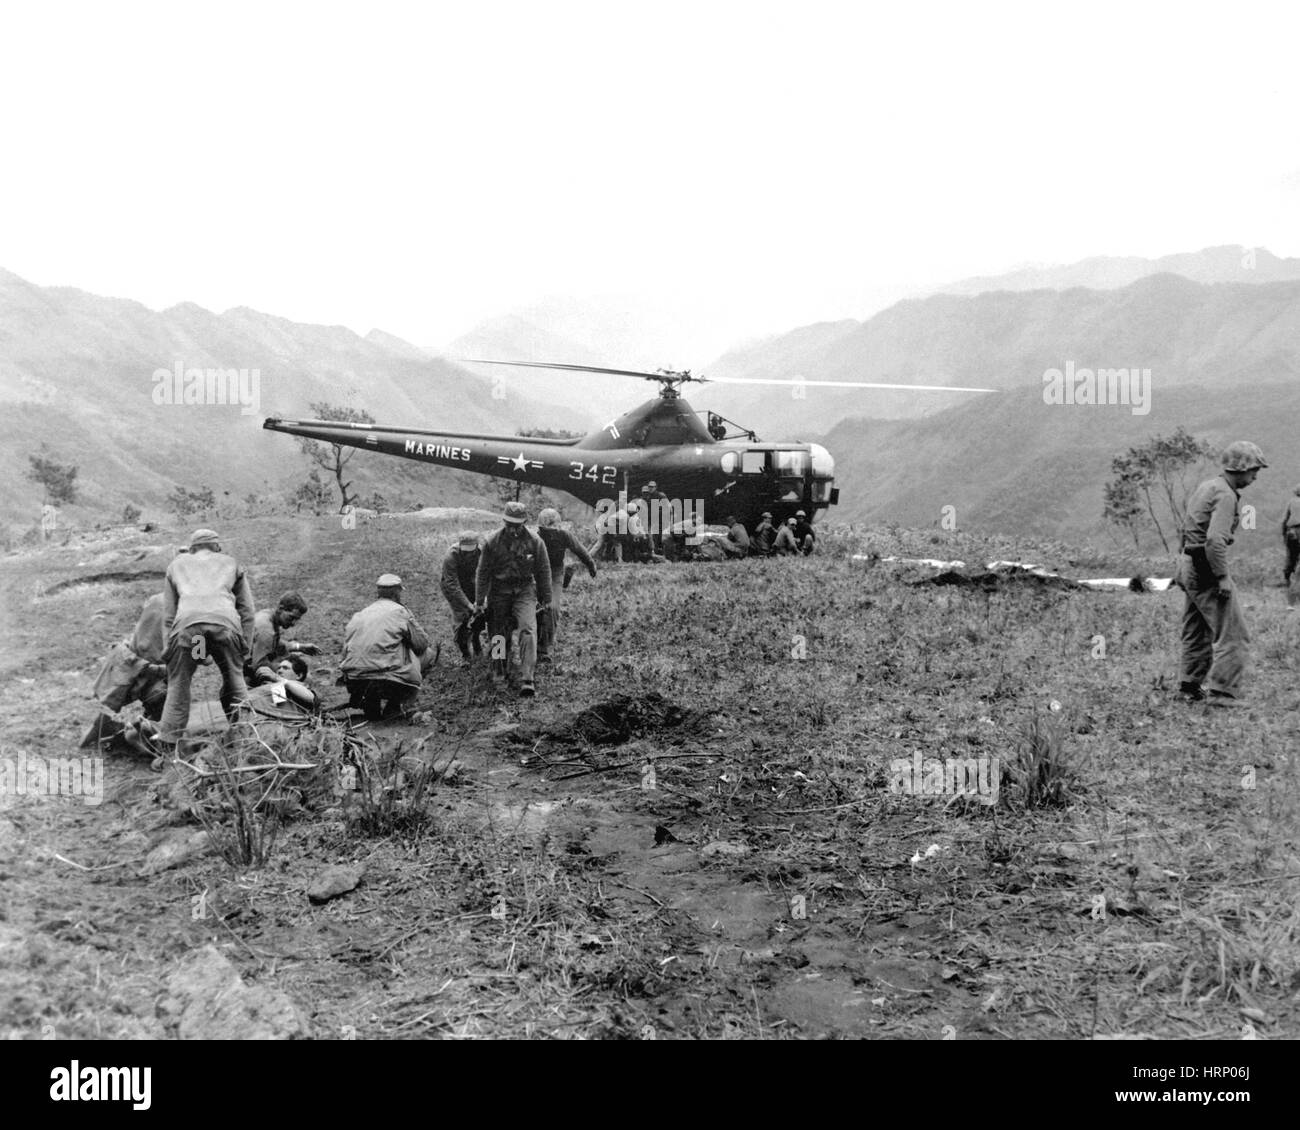 Korean War, Evacuation via Helicopter, 1951 - Stock Image